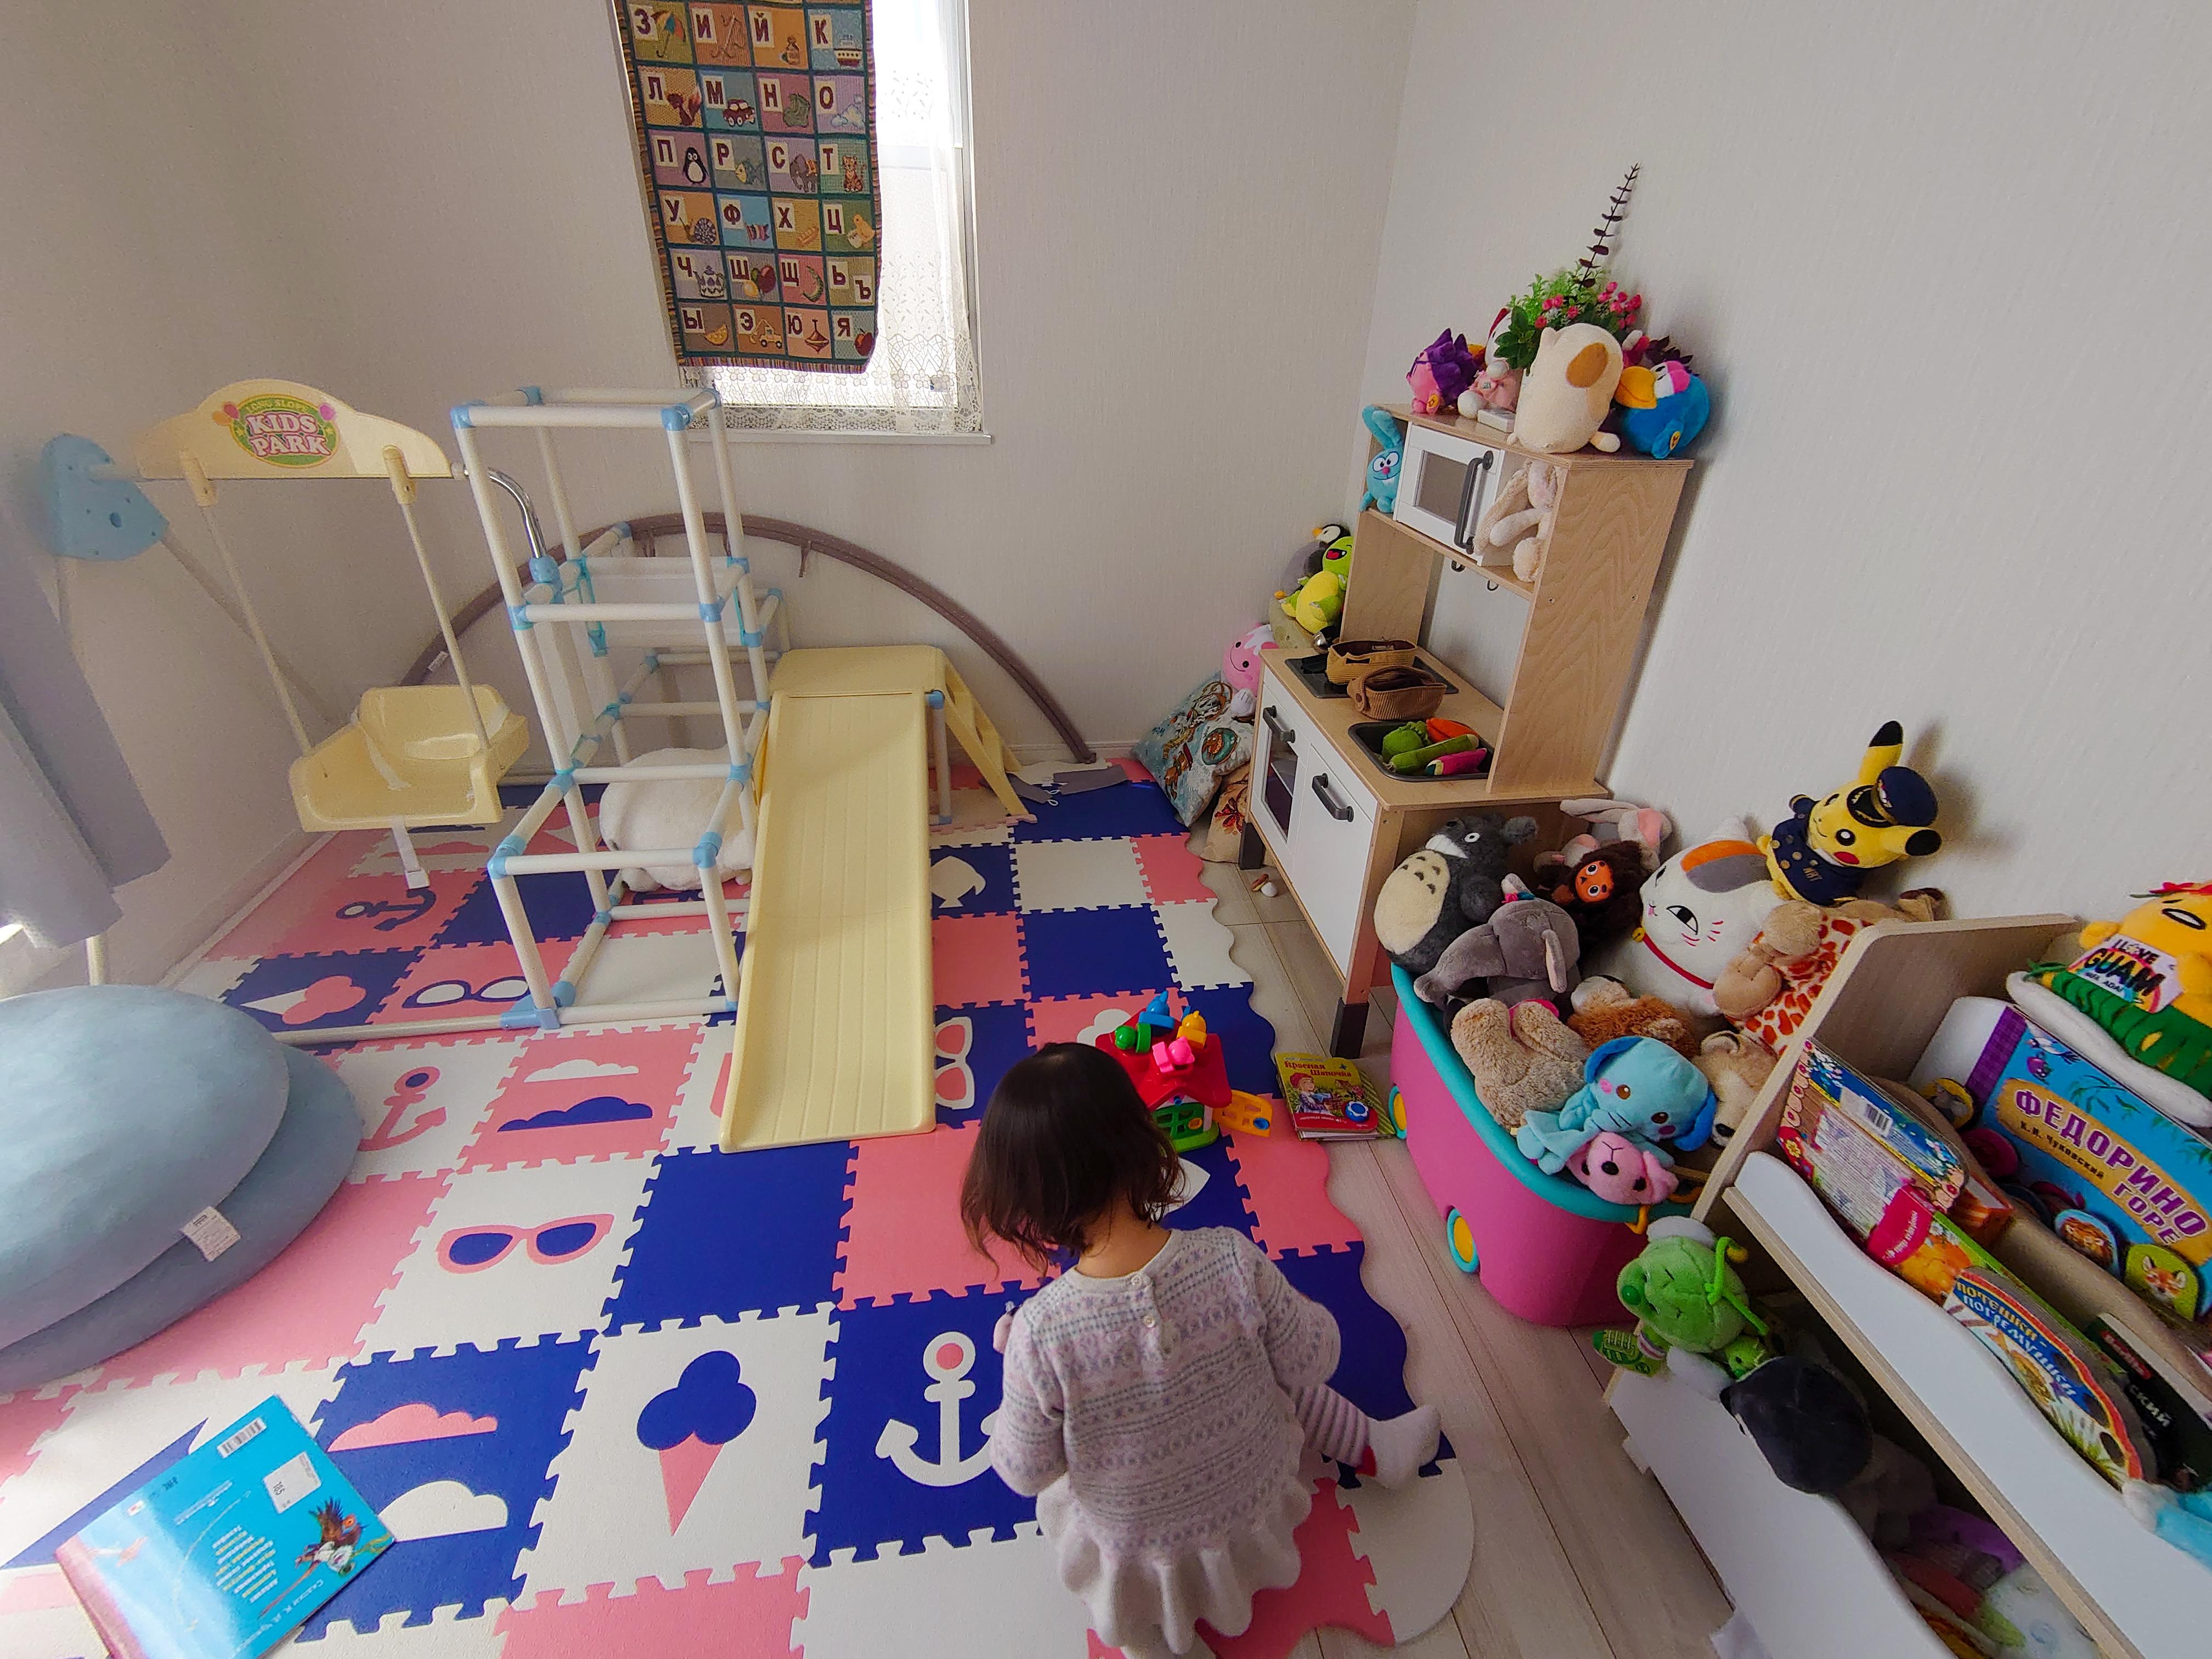 Один день домохозяйки в недоизоляции, Япония, фото 12